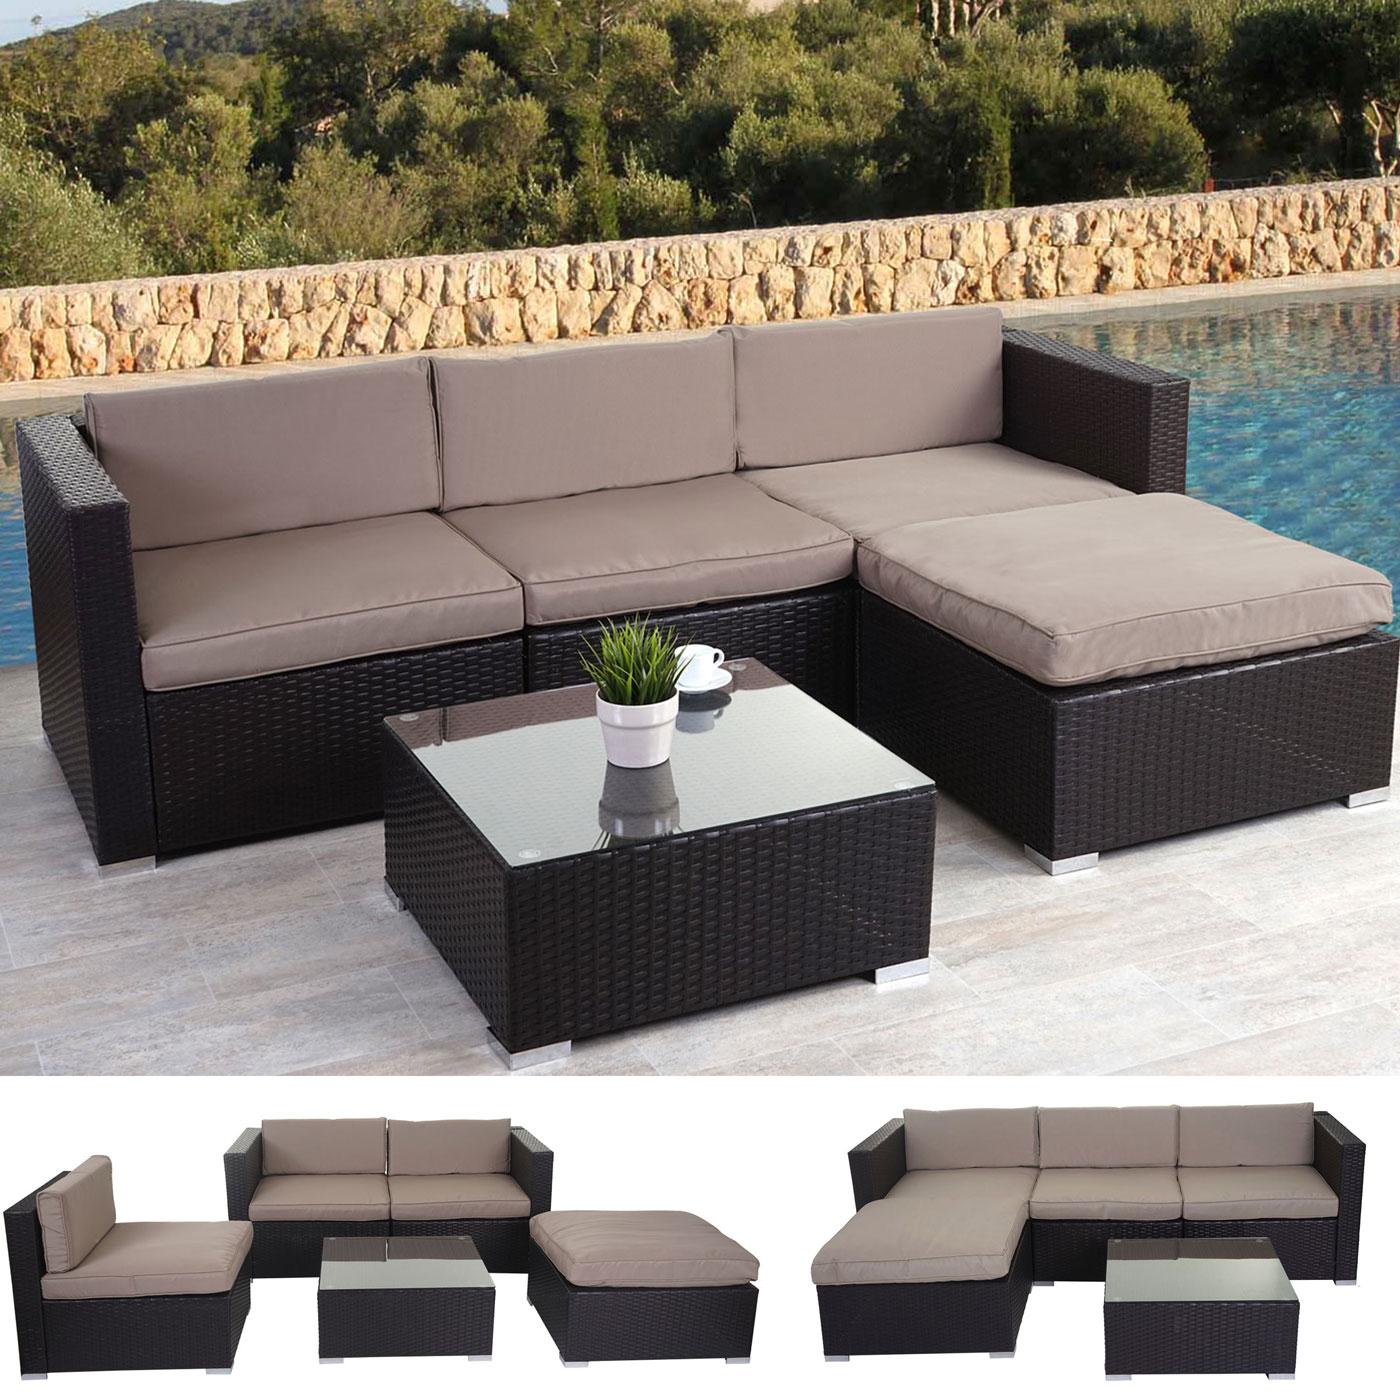 poly rattan garnitur brindisi gartengarnitur sitzgruppe lounge set braun kissen beige. Black Bedroom Furniture Sets. Home Design Ideas